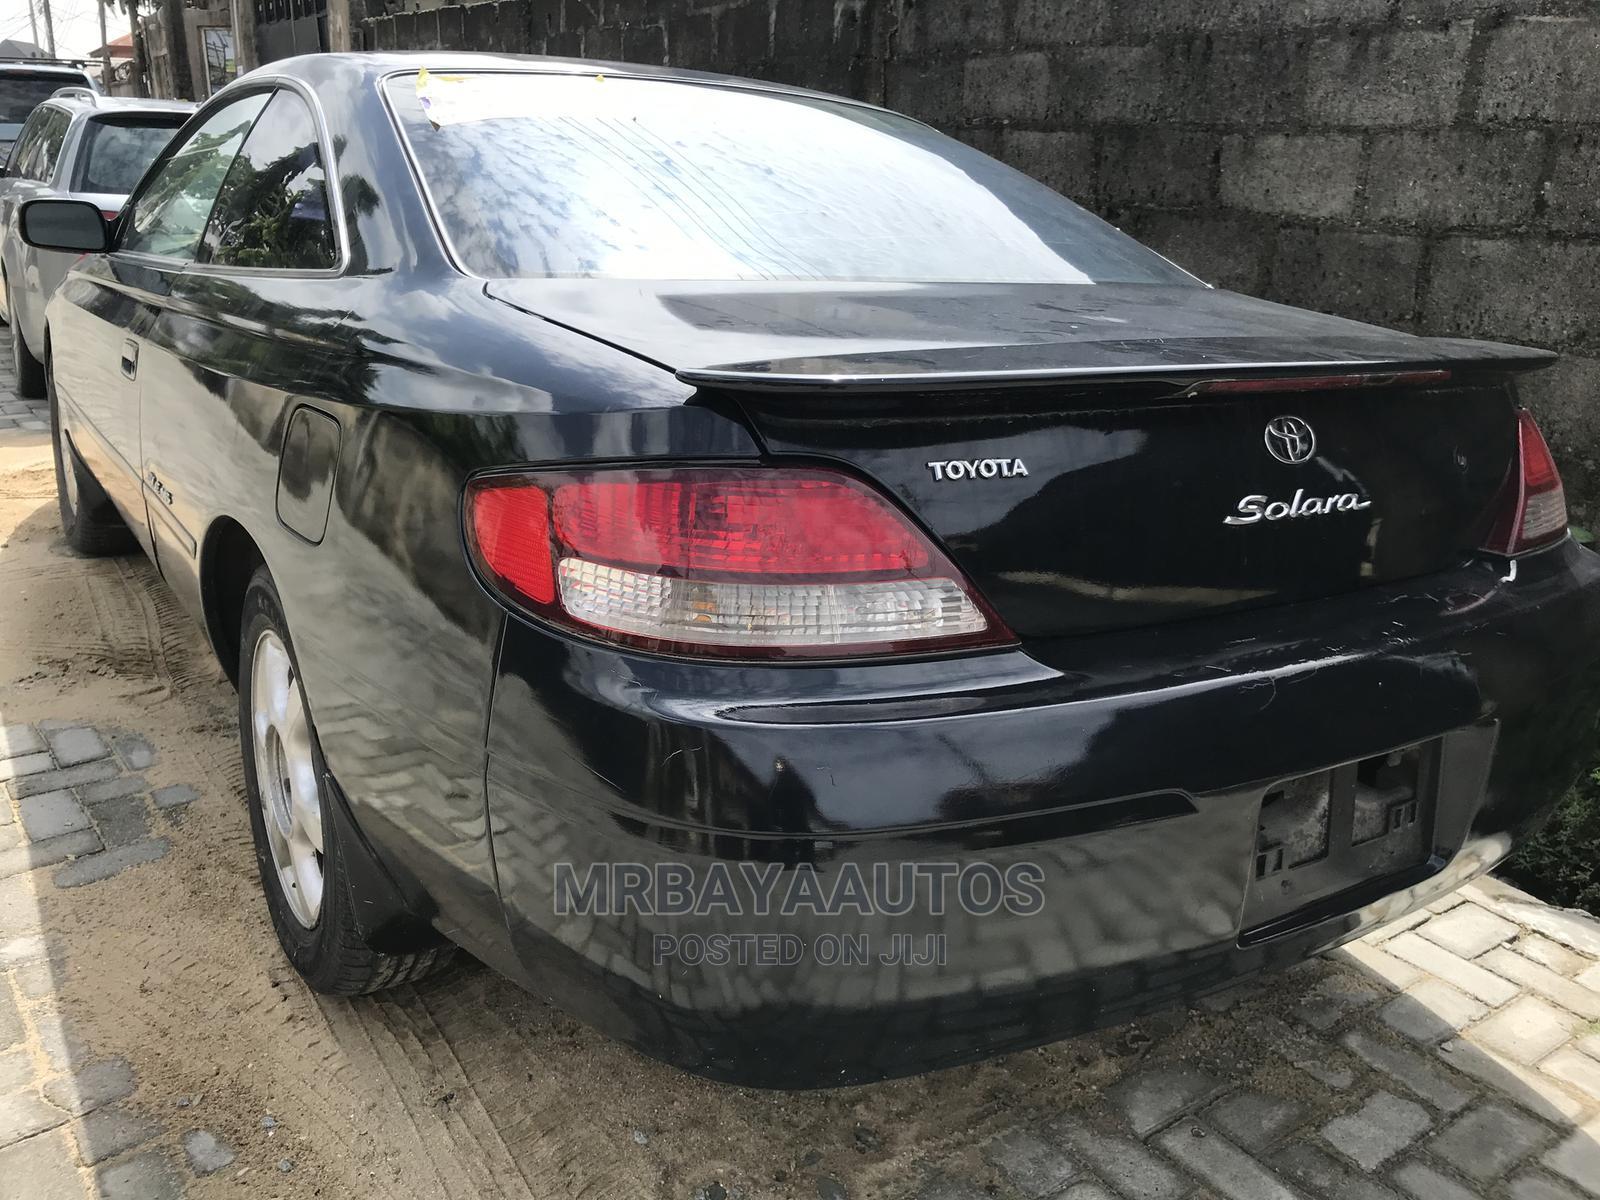 Toyota Solara 2004 Black   Cars for sale in Lekki, Lagos State, Nigeria